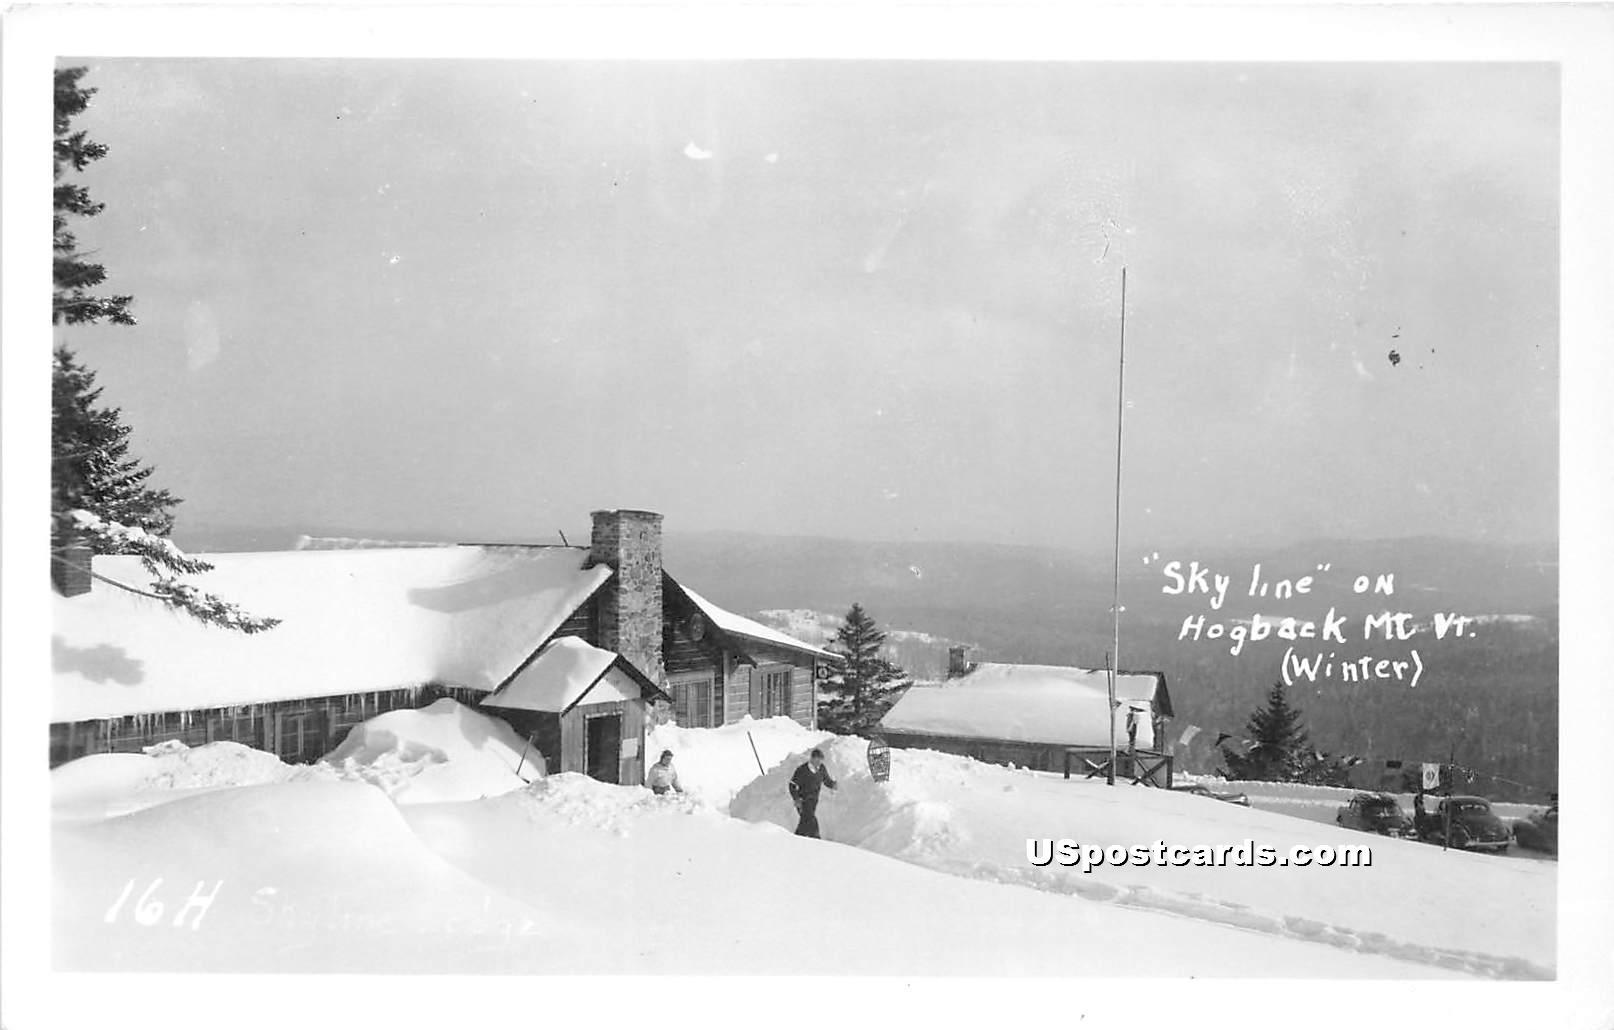 Skyline - Hogback Mountain, Vermont VT Postcard